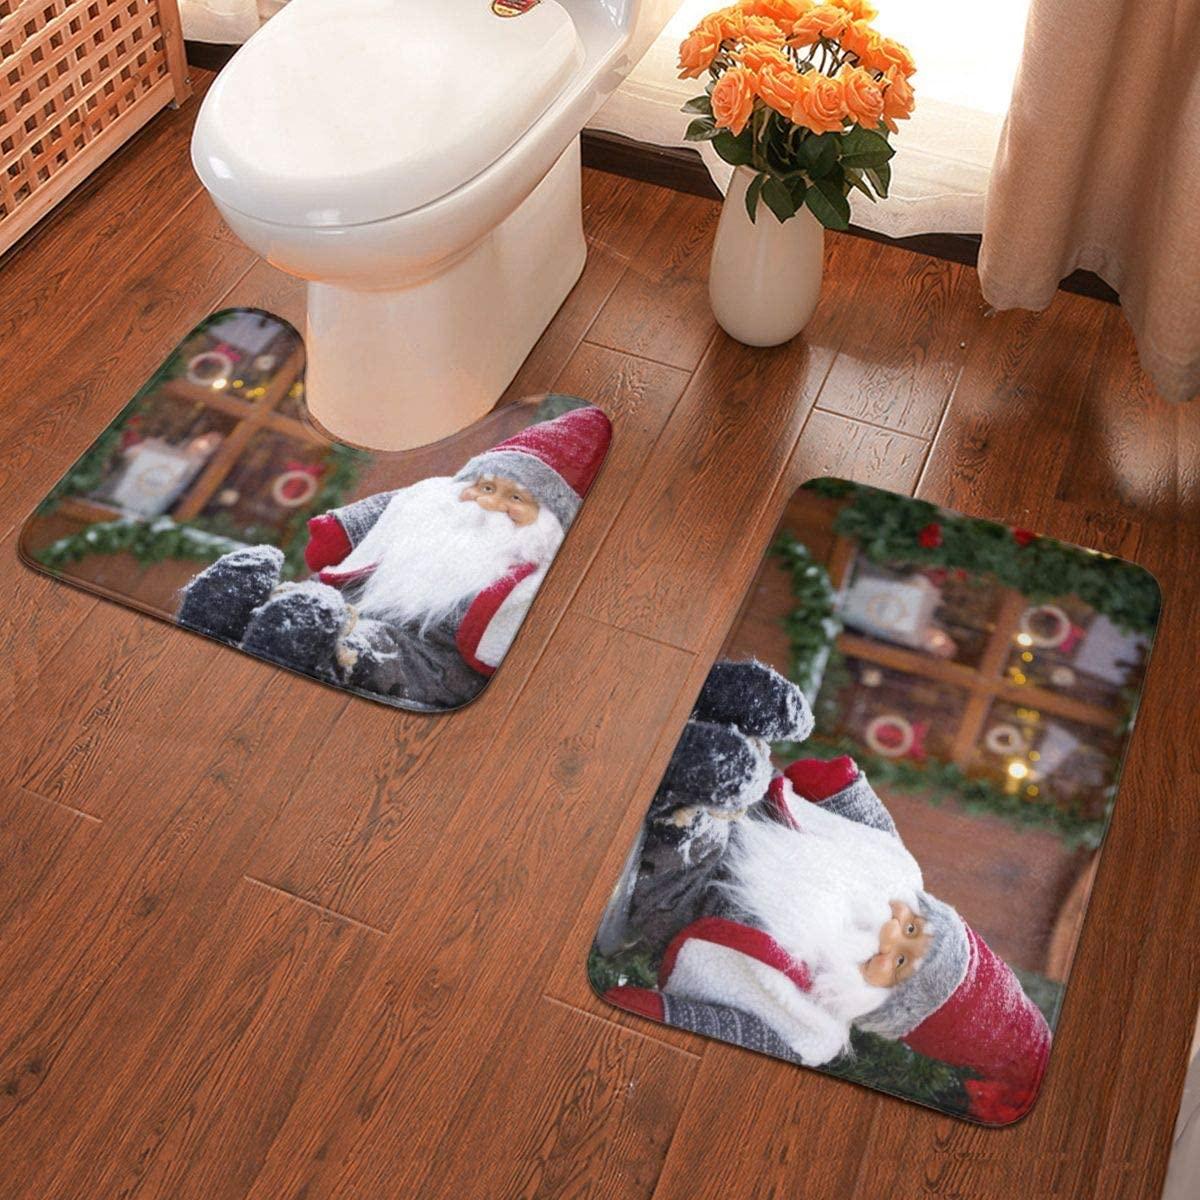 Santa Claus Figurines Soft Flannel Bathroom Rugs Non Slip 2-Piece Bath Mat Set Super Absorbent Bath Rug + U-Shaped Contour Toilet Mat